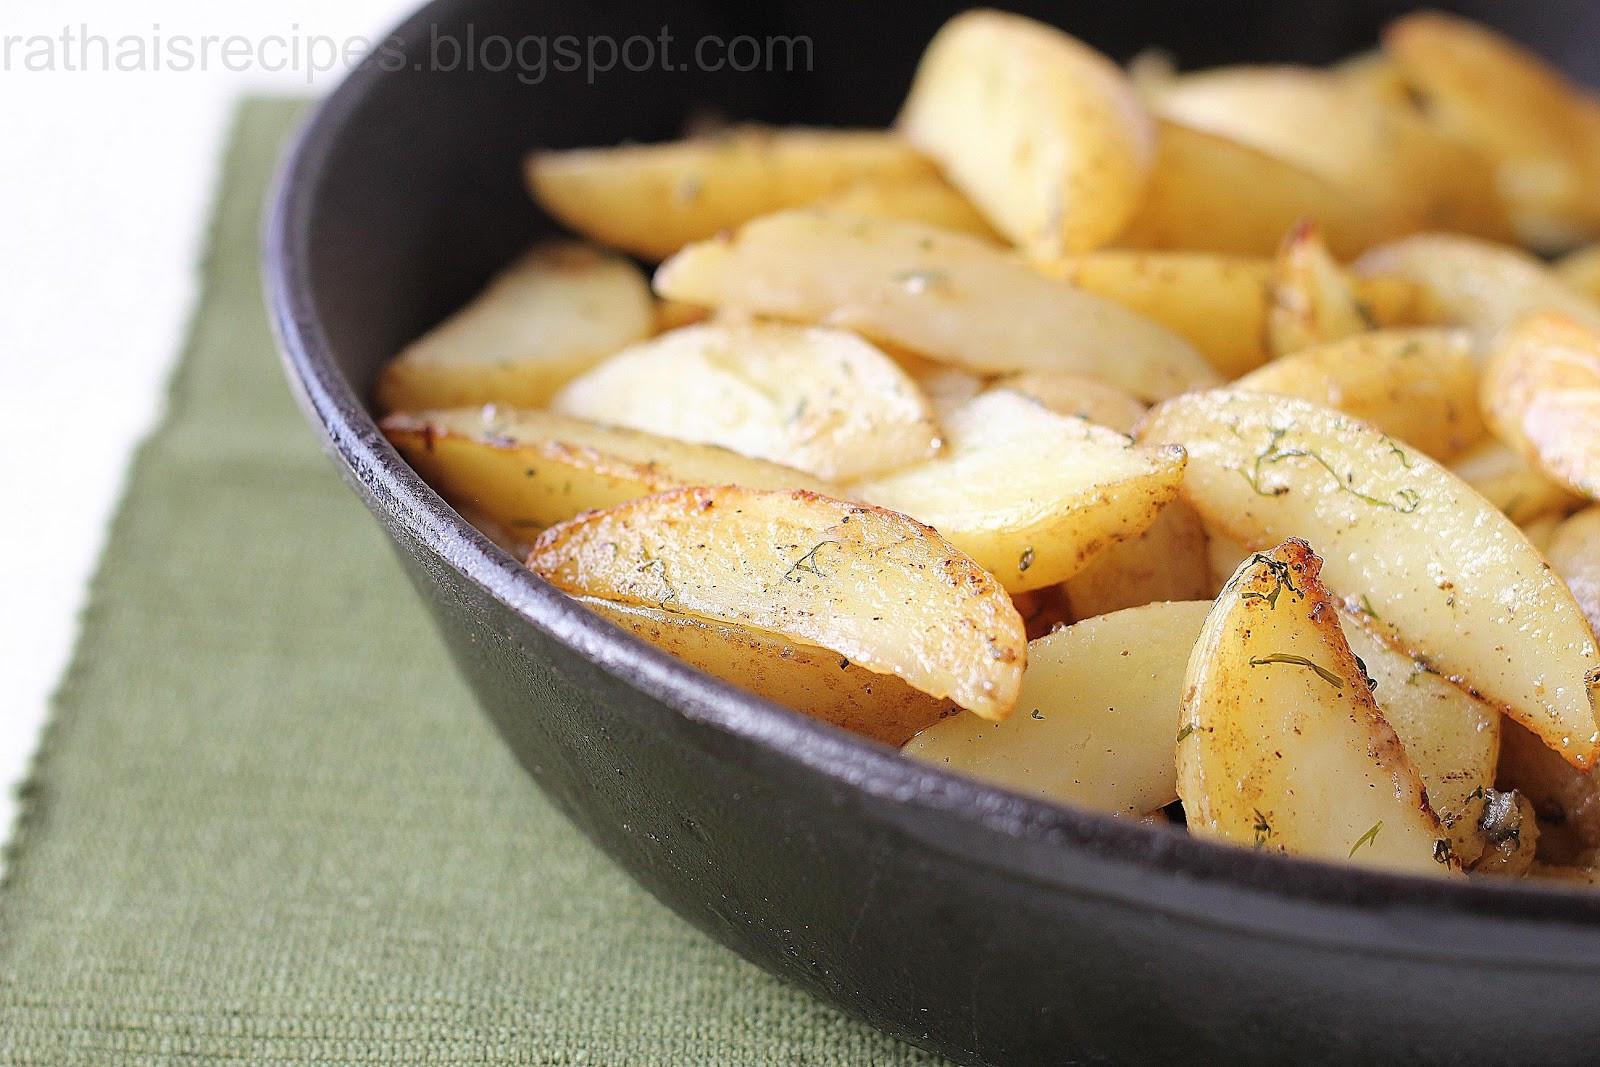 Bake A Potato In The Oven  Rathai s Recipes Oven baked potatoes Klyftpotatis